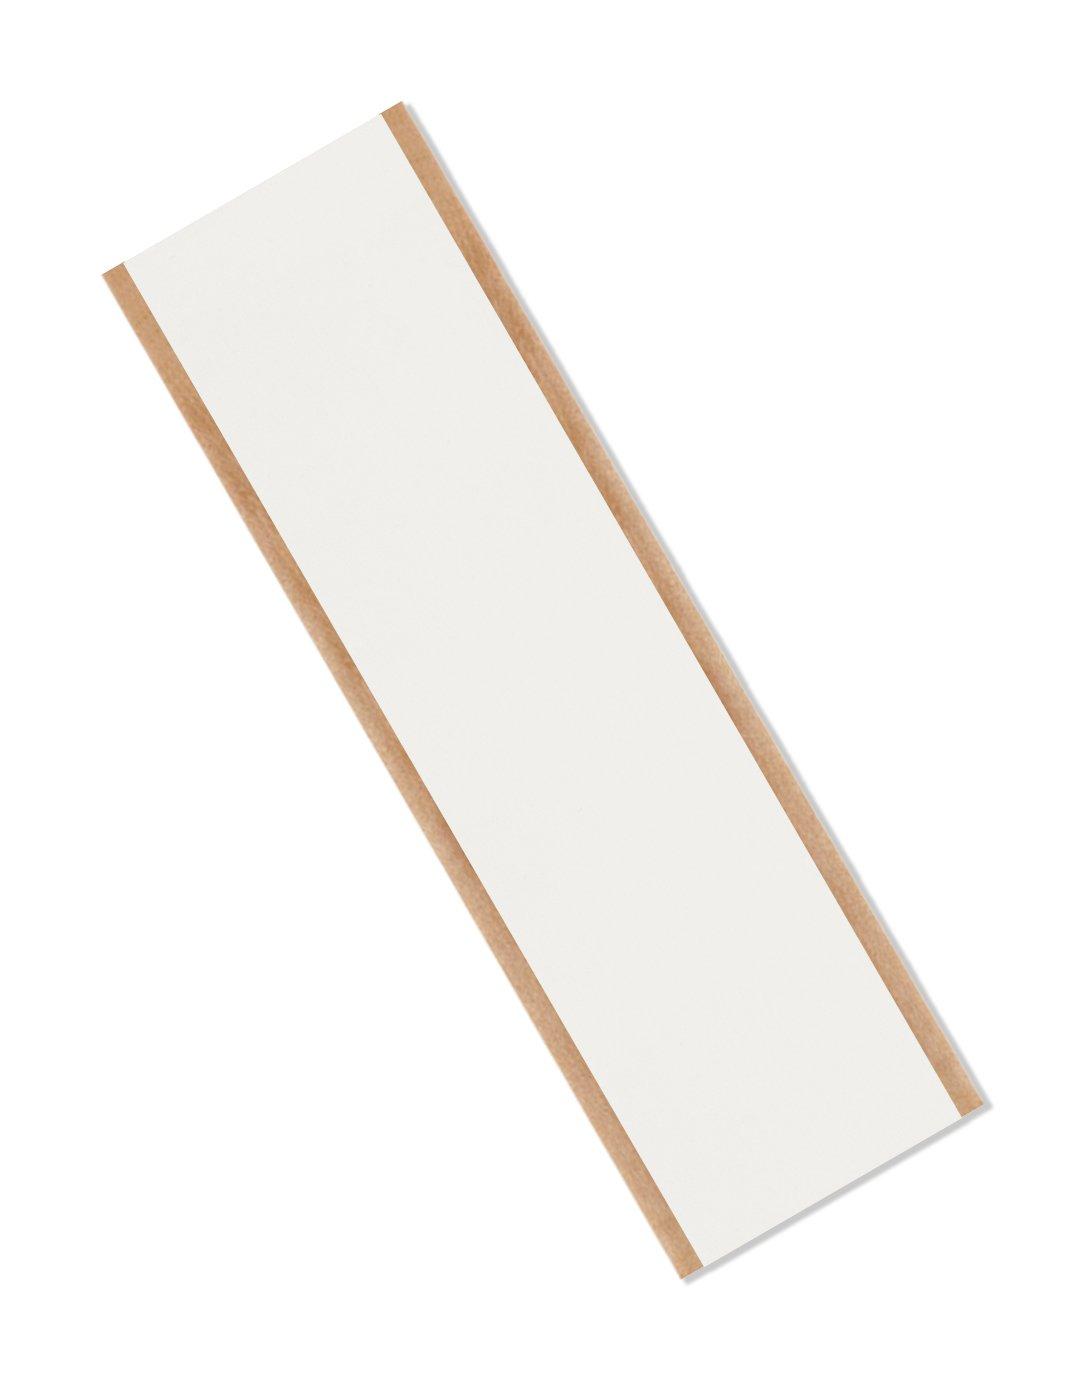 3M 4462W White Adhesive Tapes 31 mil 10